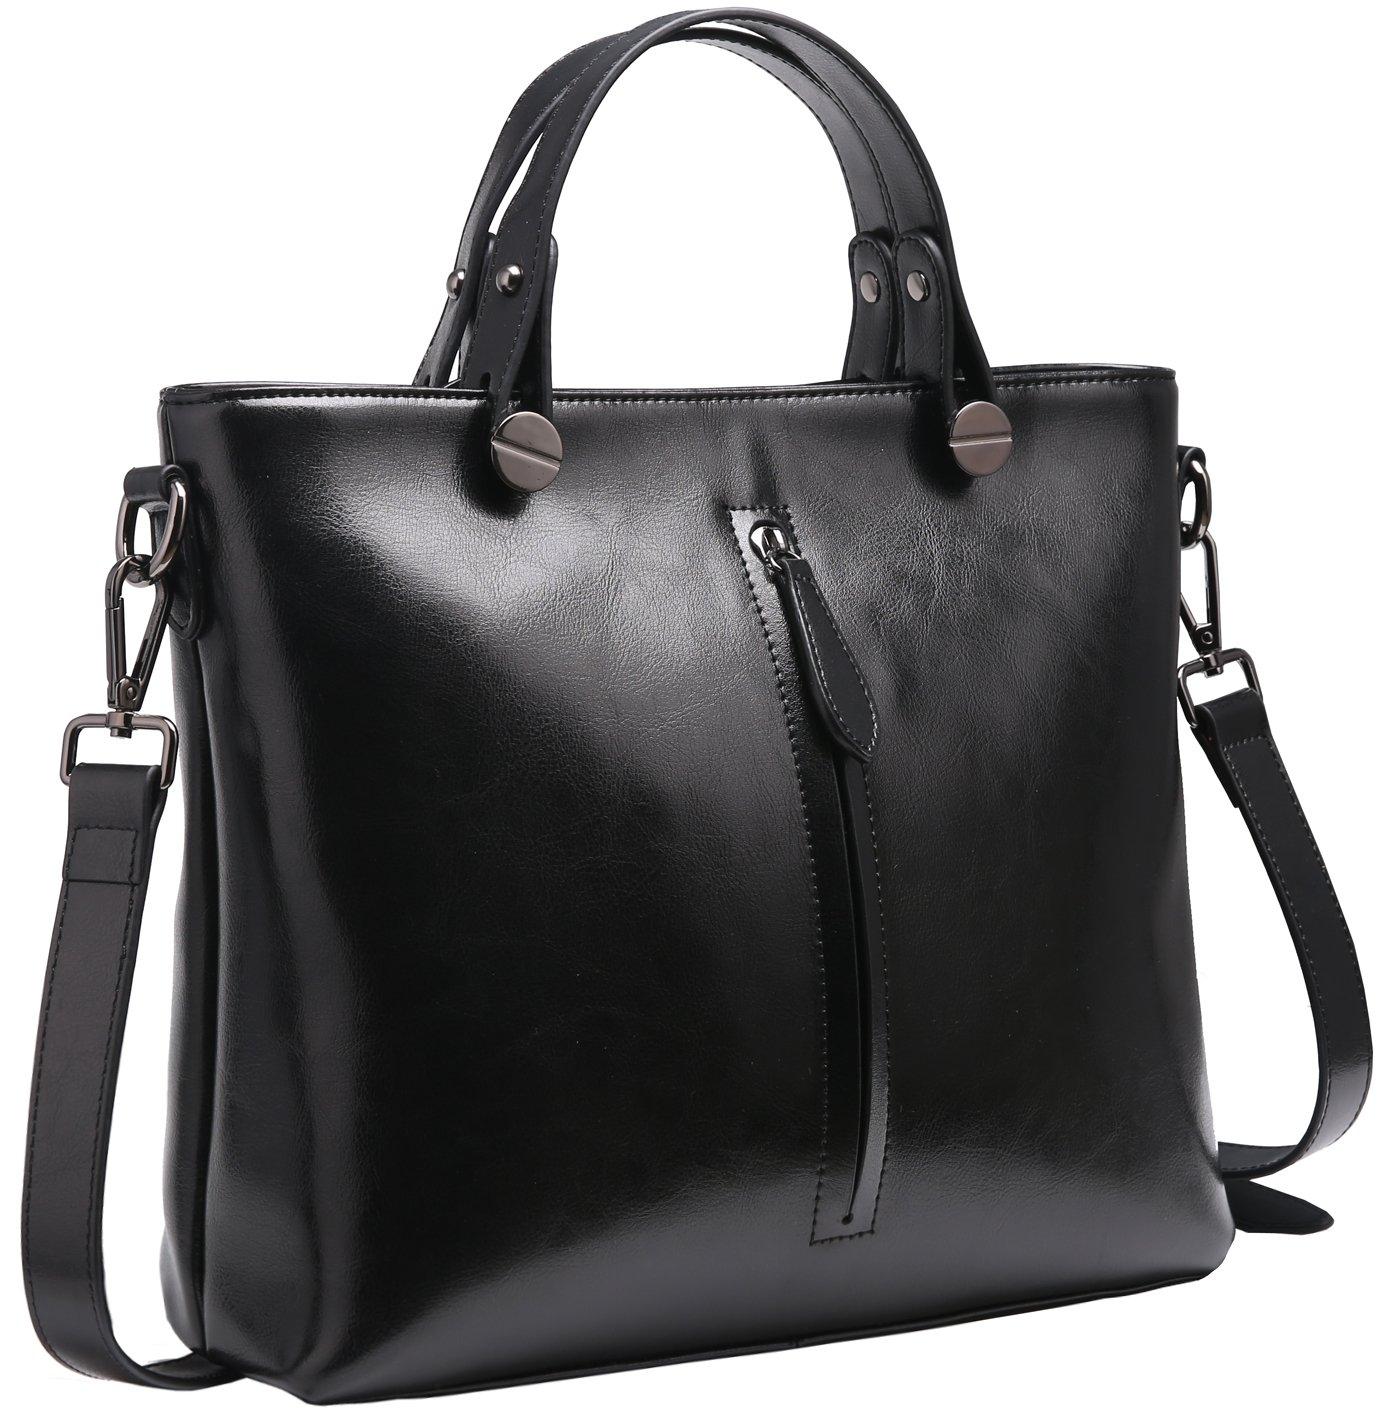 0602df49f092 Heshe Womens Leather Shoulder Handbags Work Totes Top Handle Bag Satchel  Designer Purse Cross Body Bags